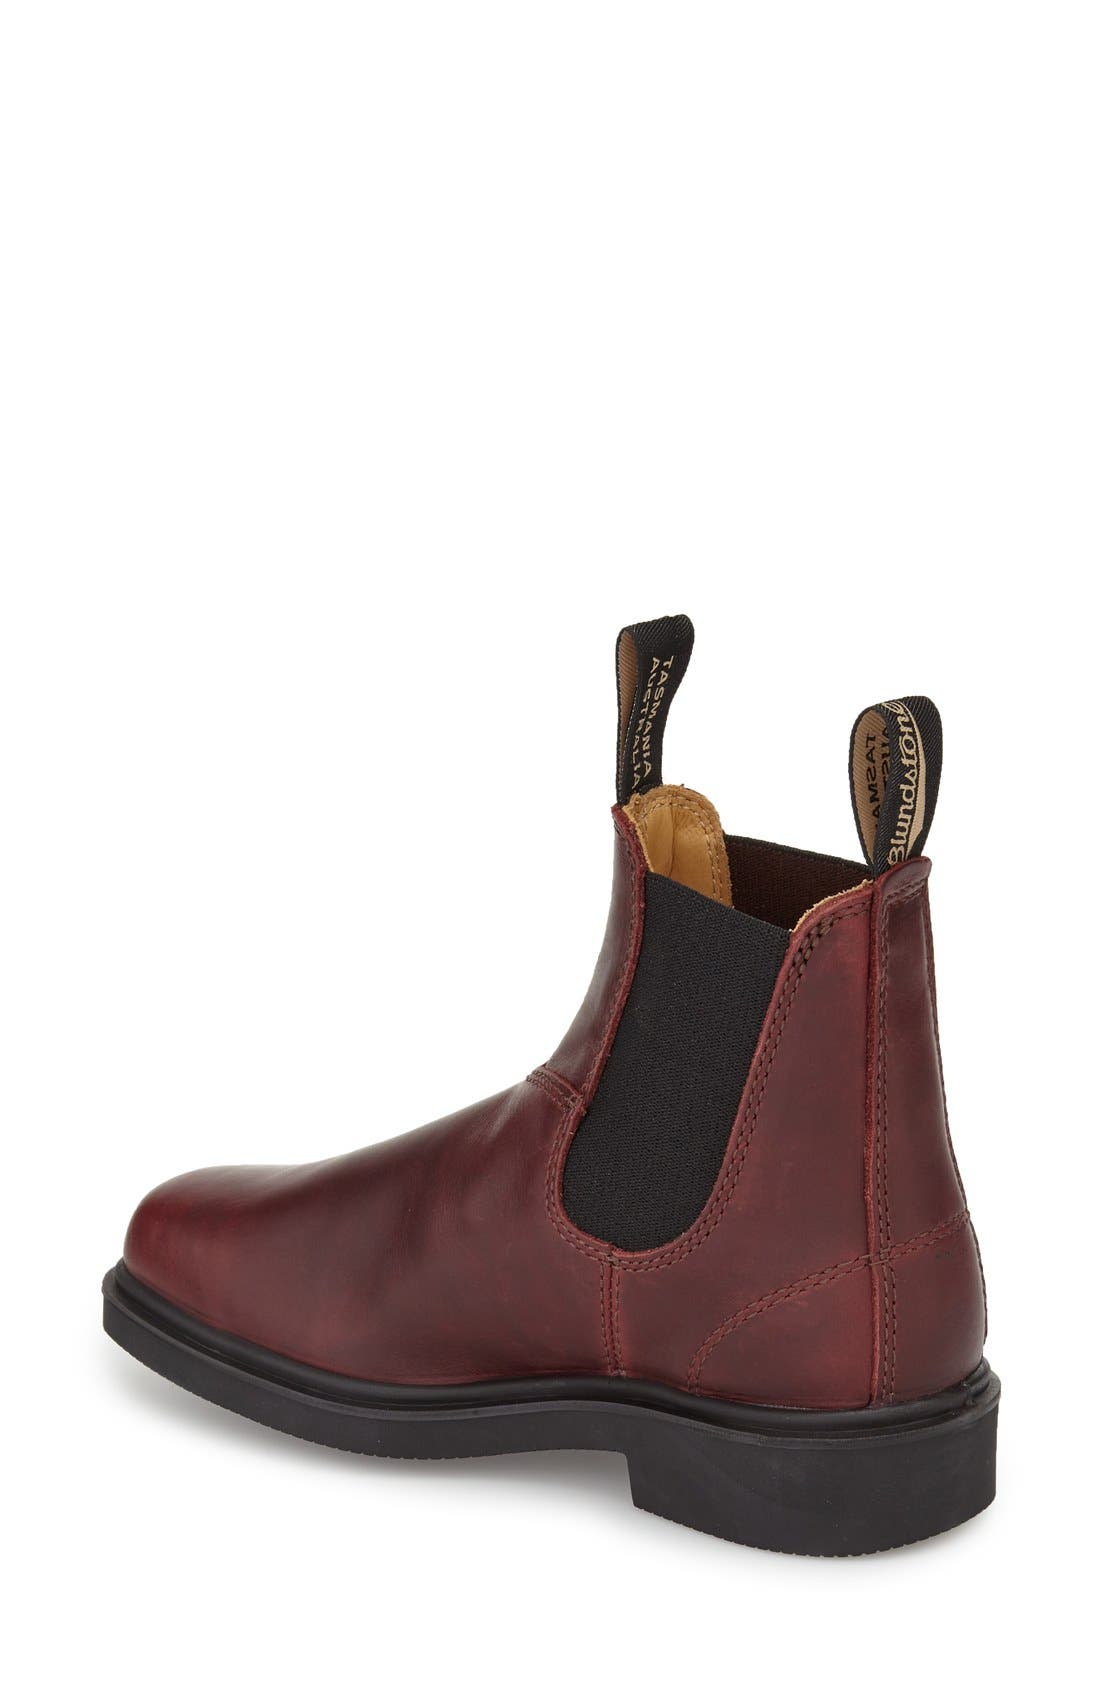 Footwear 'Original - 500 Series' Water Resistant Chelsea Boot,                             Alternate thumbnail 4, color,